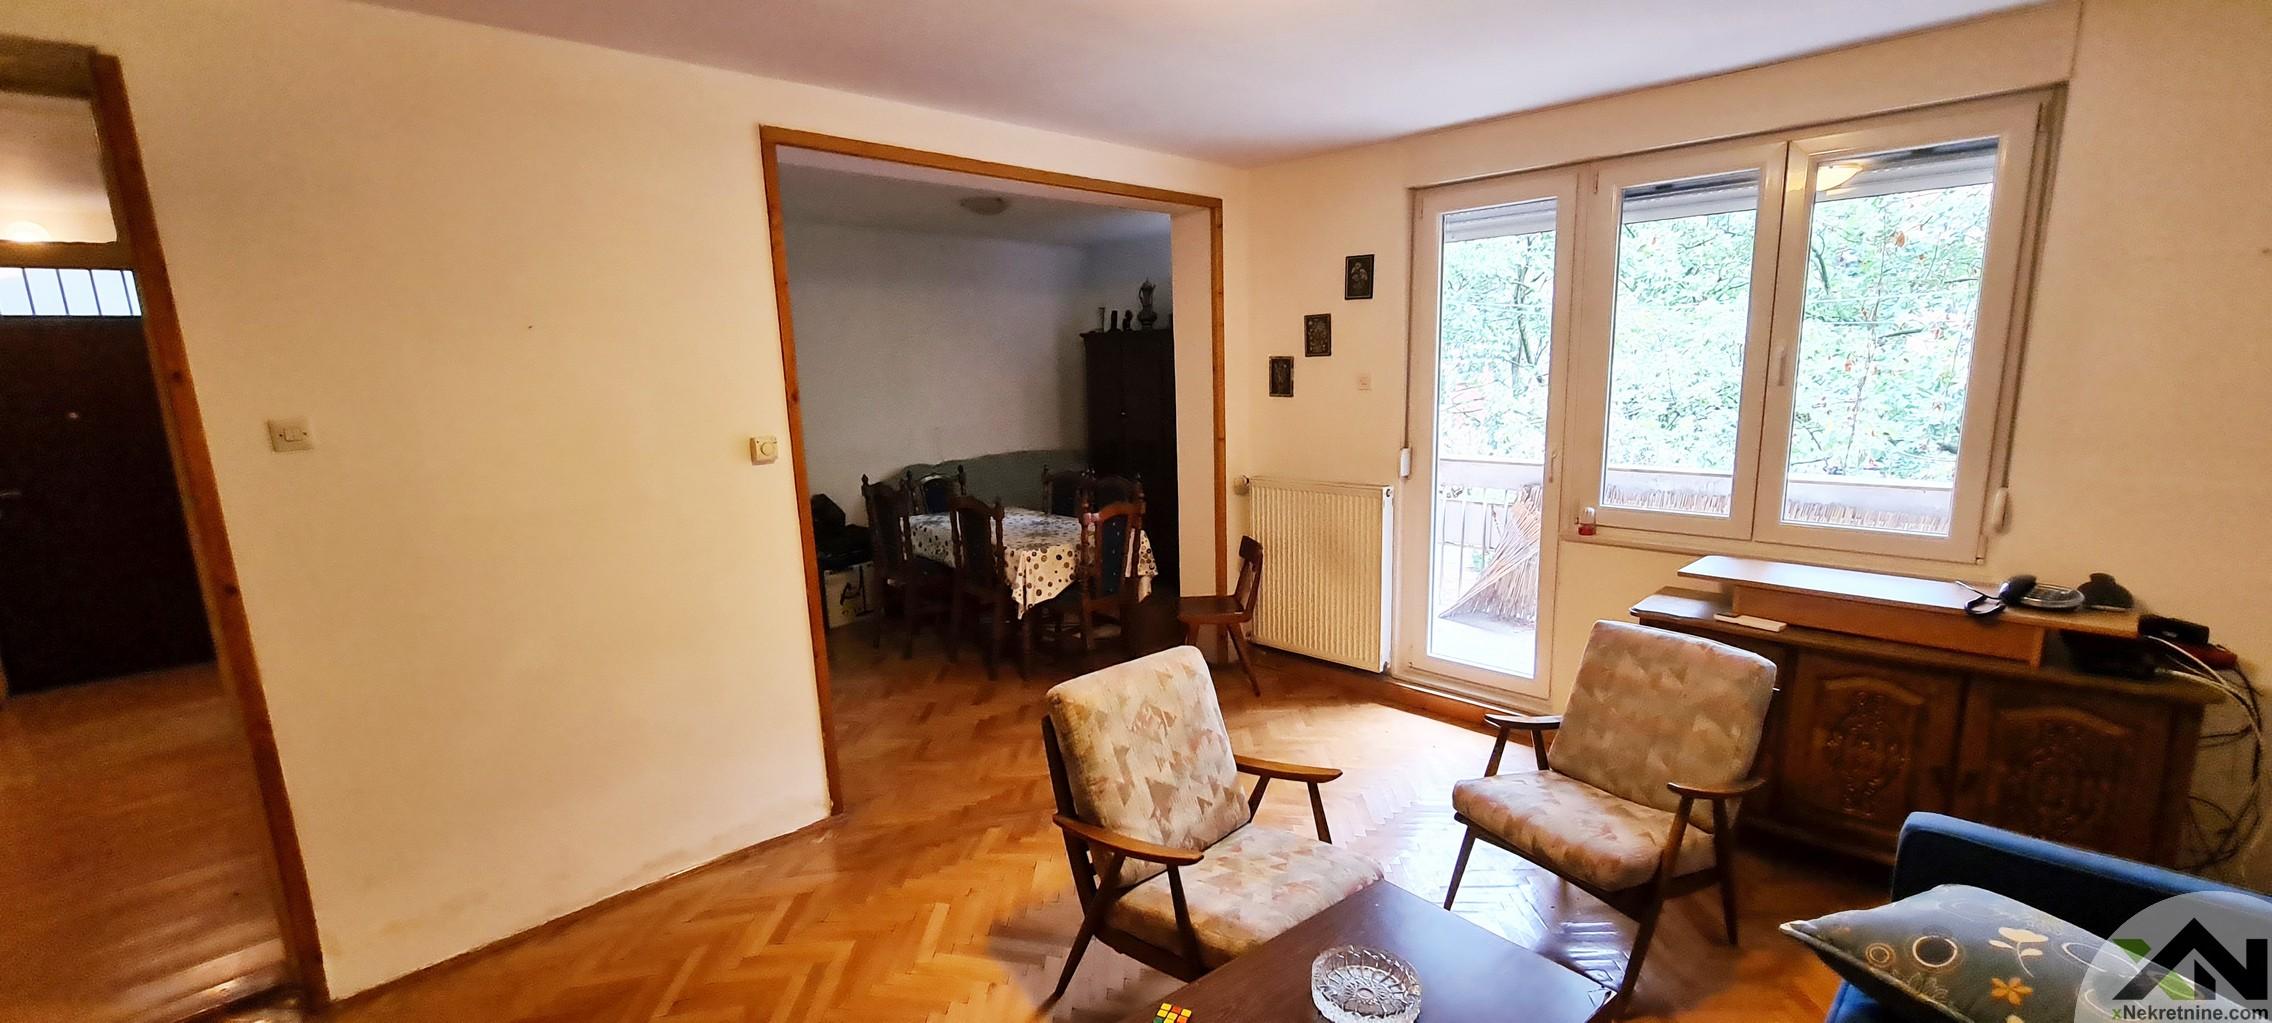 Dvosoban stan sa garažom - Zagrebačka ulica